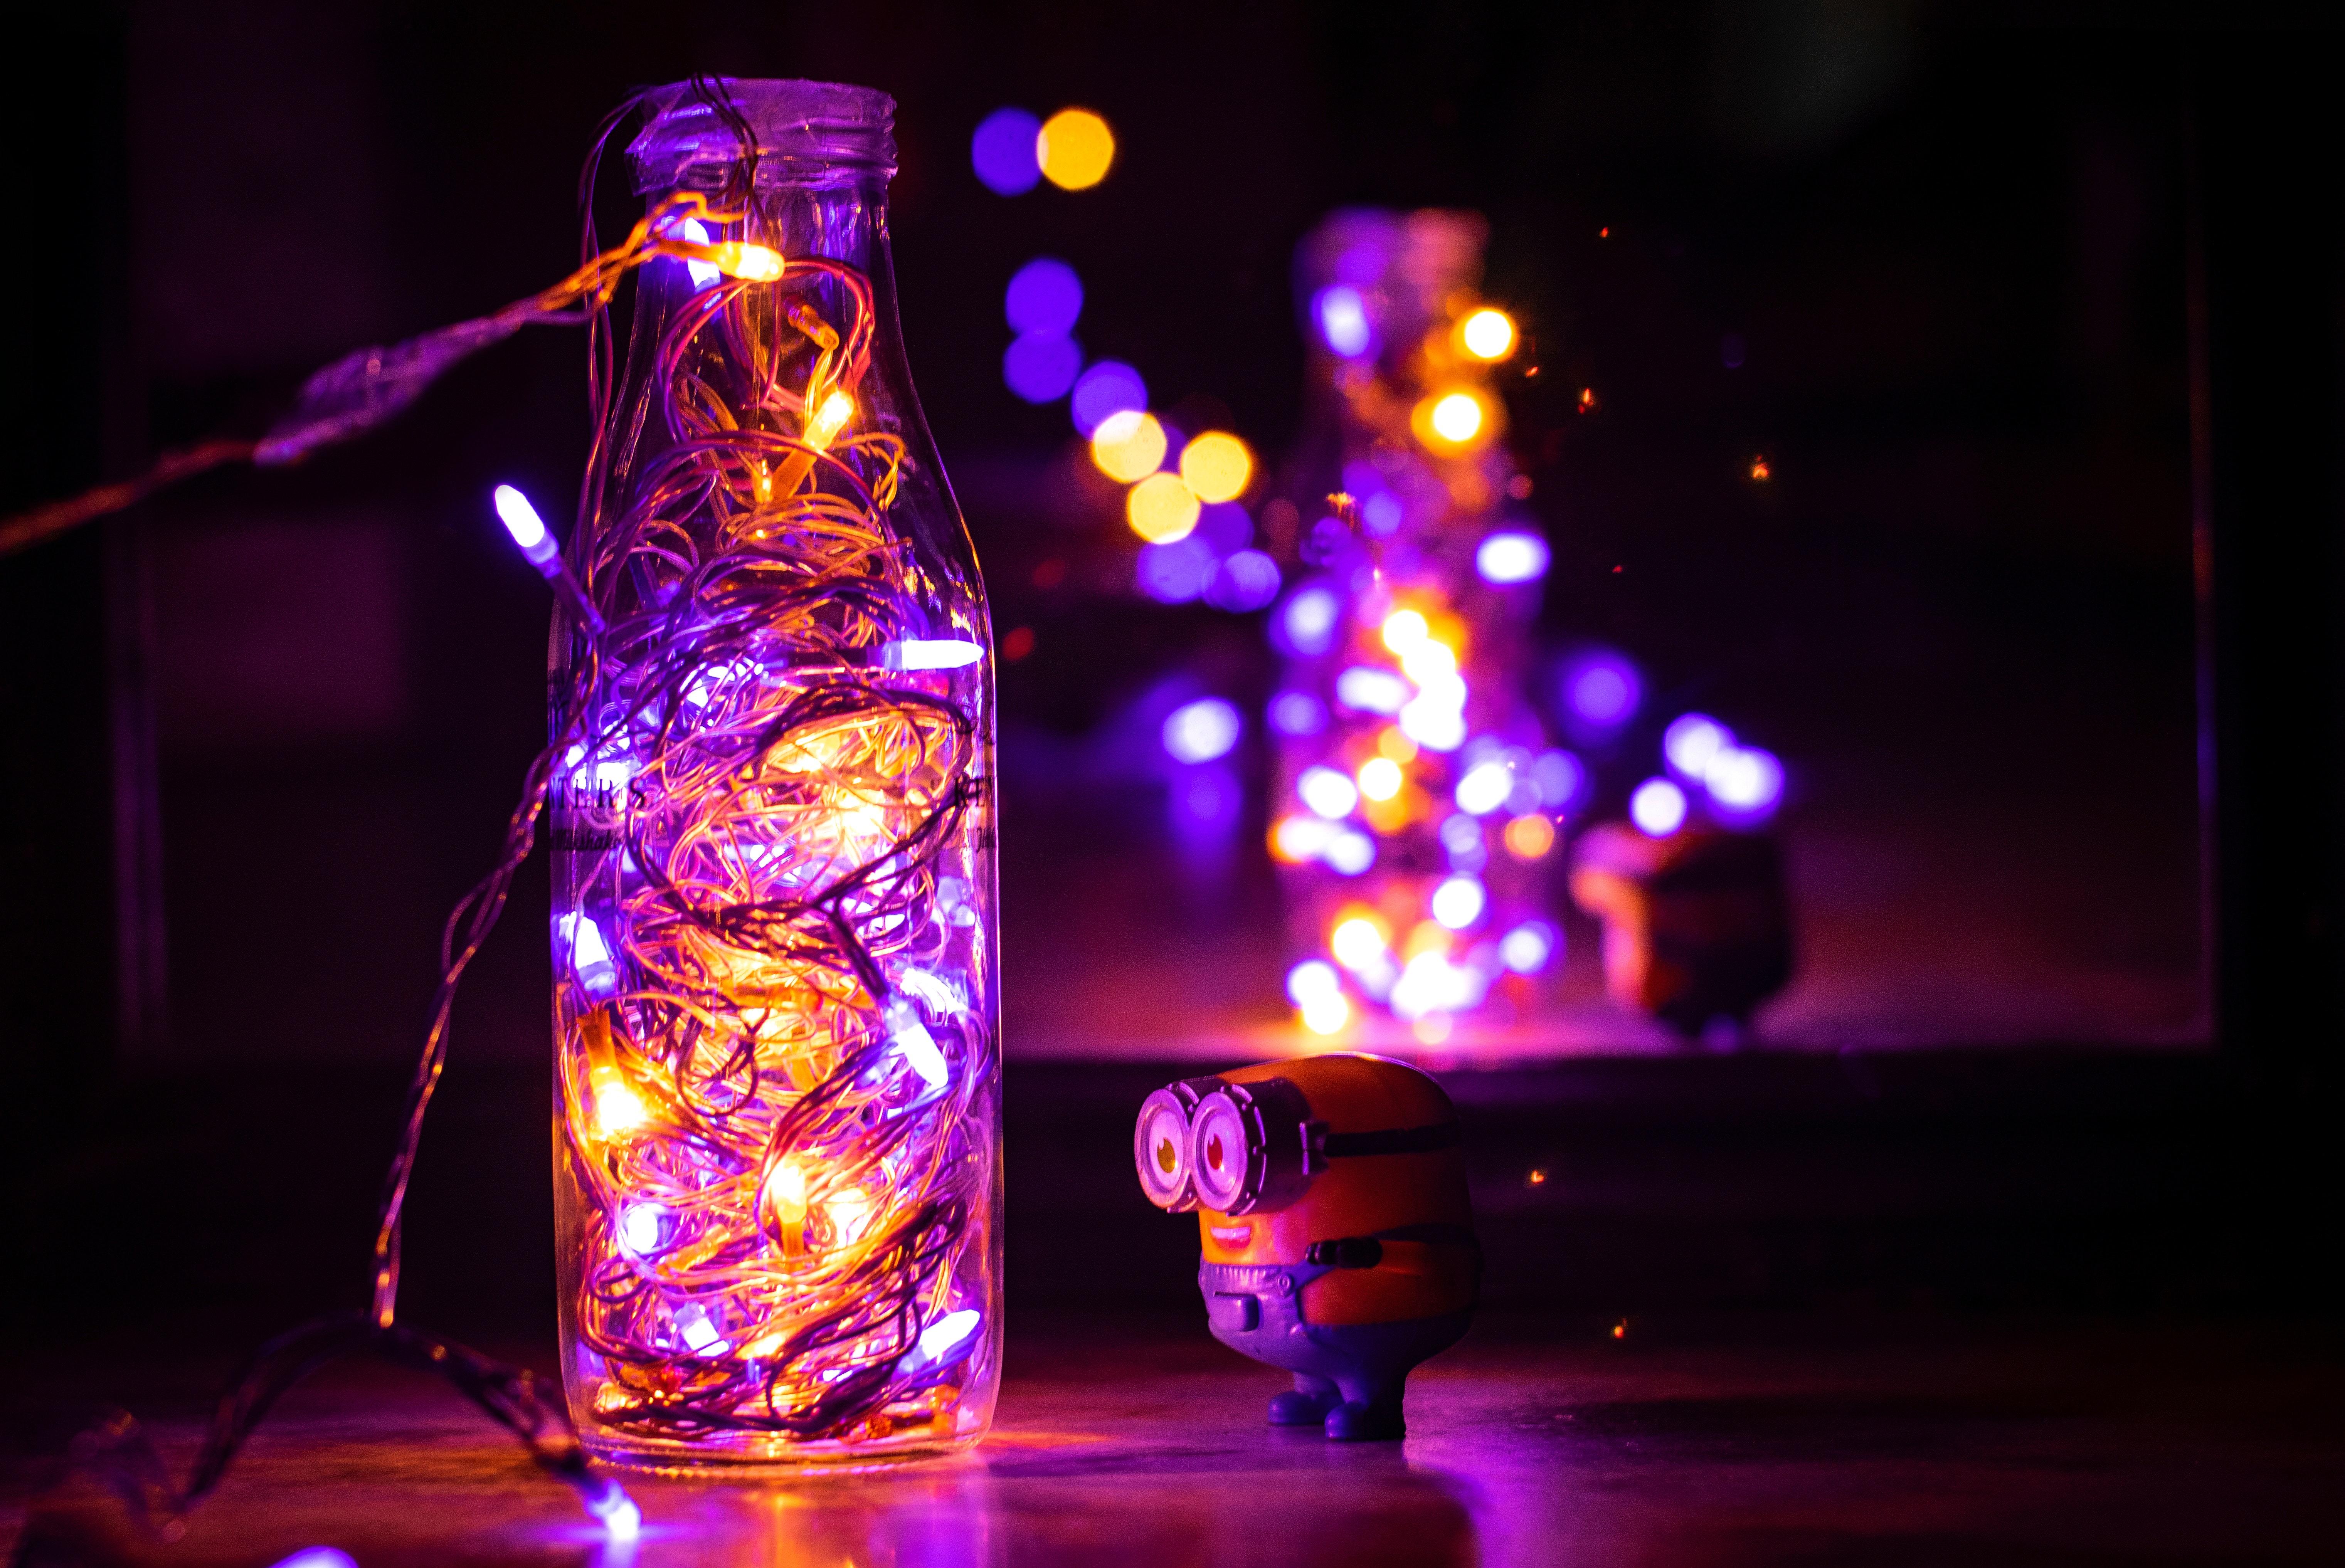 Bright Fairy Lights Illuminated Lights Macro Minion String Lights Toy Public Domain